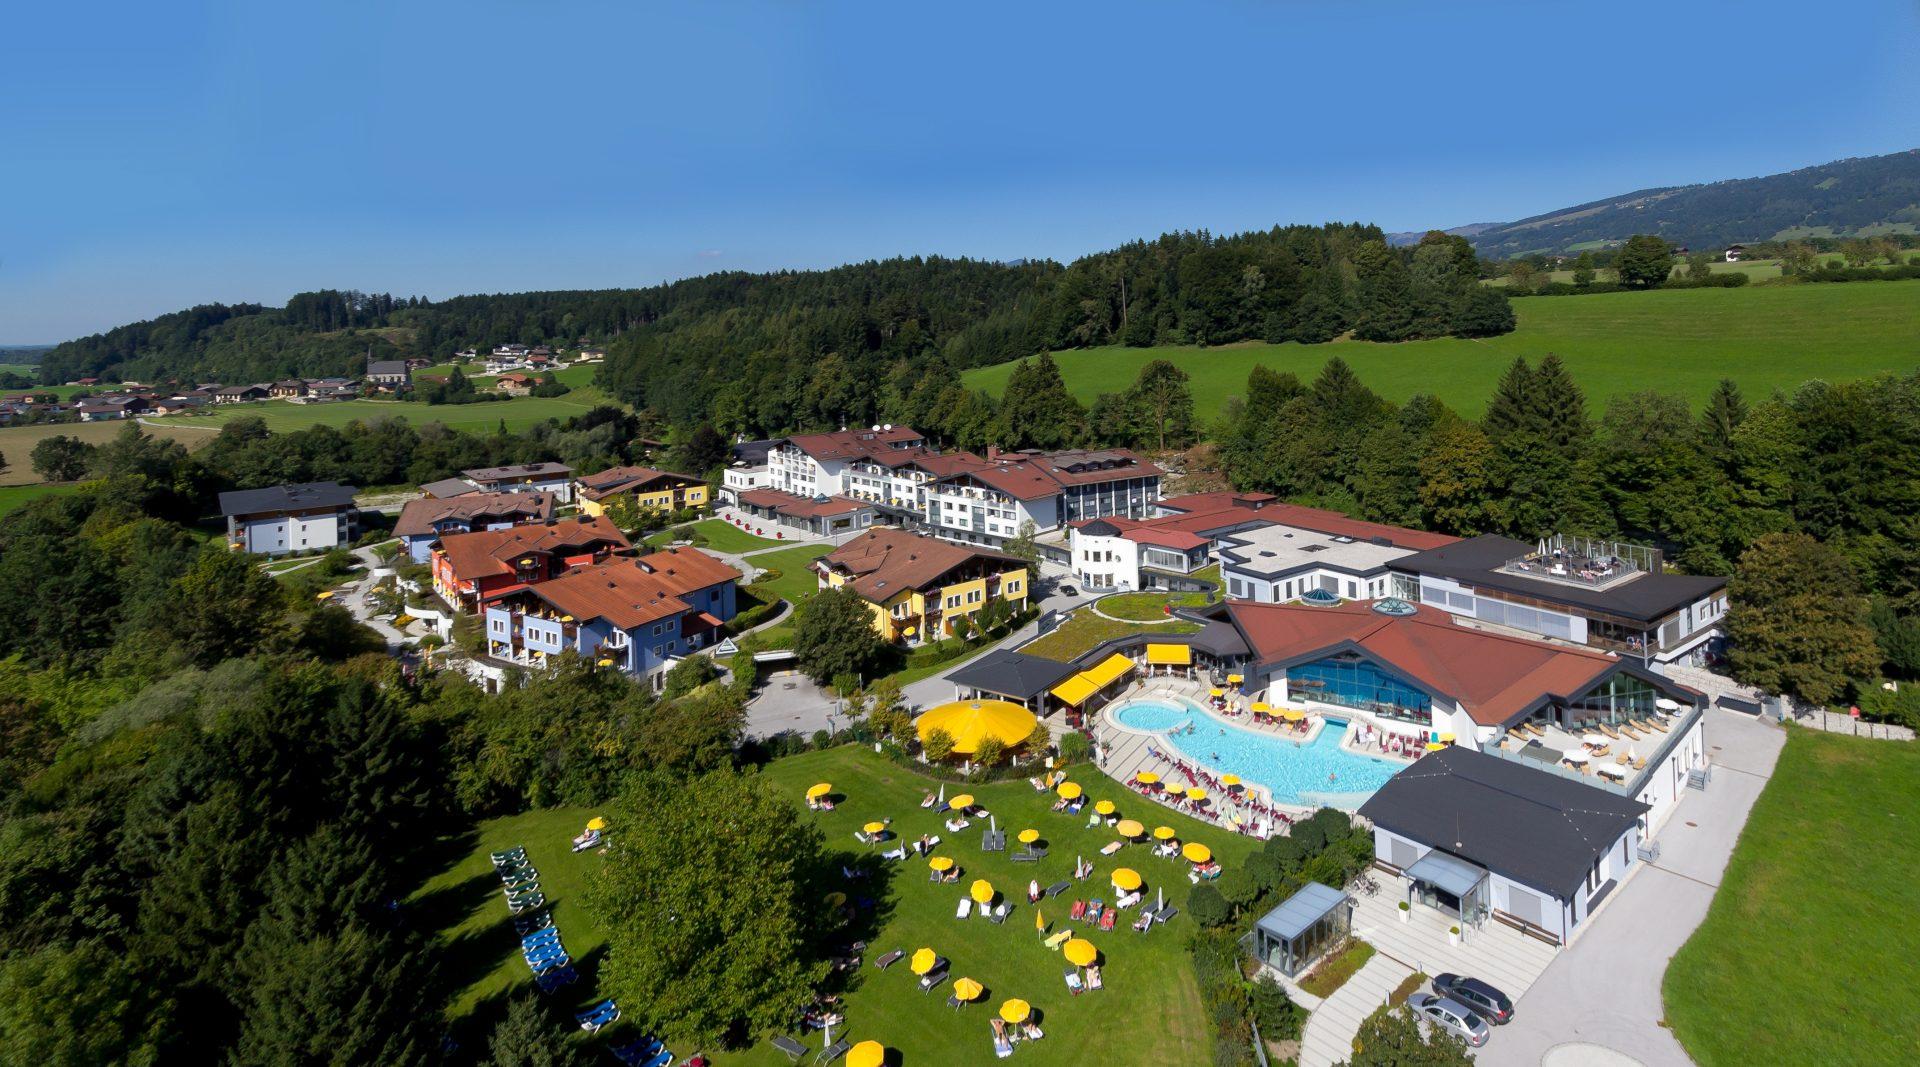 (c) Medizinisches Zentrum Bad Vigaun